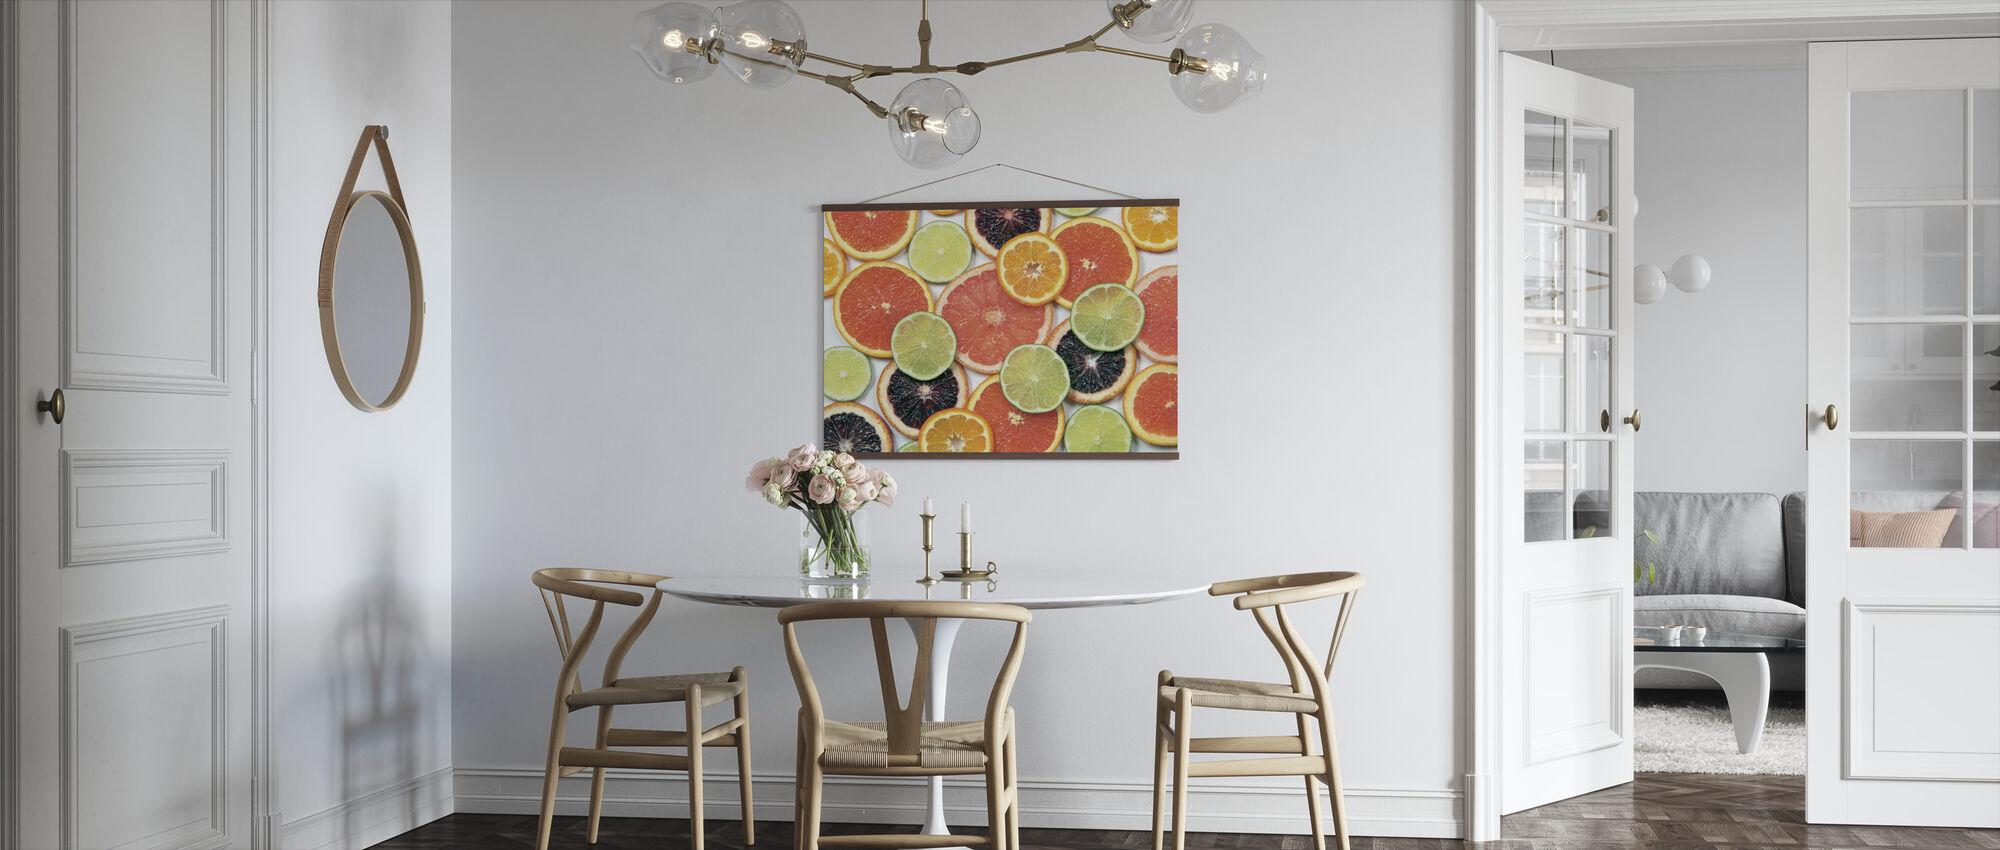 Sunny Citrus IV - Poster - Kitchen